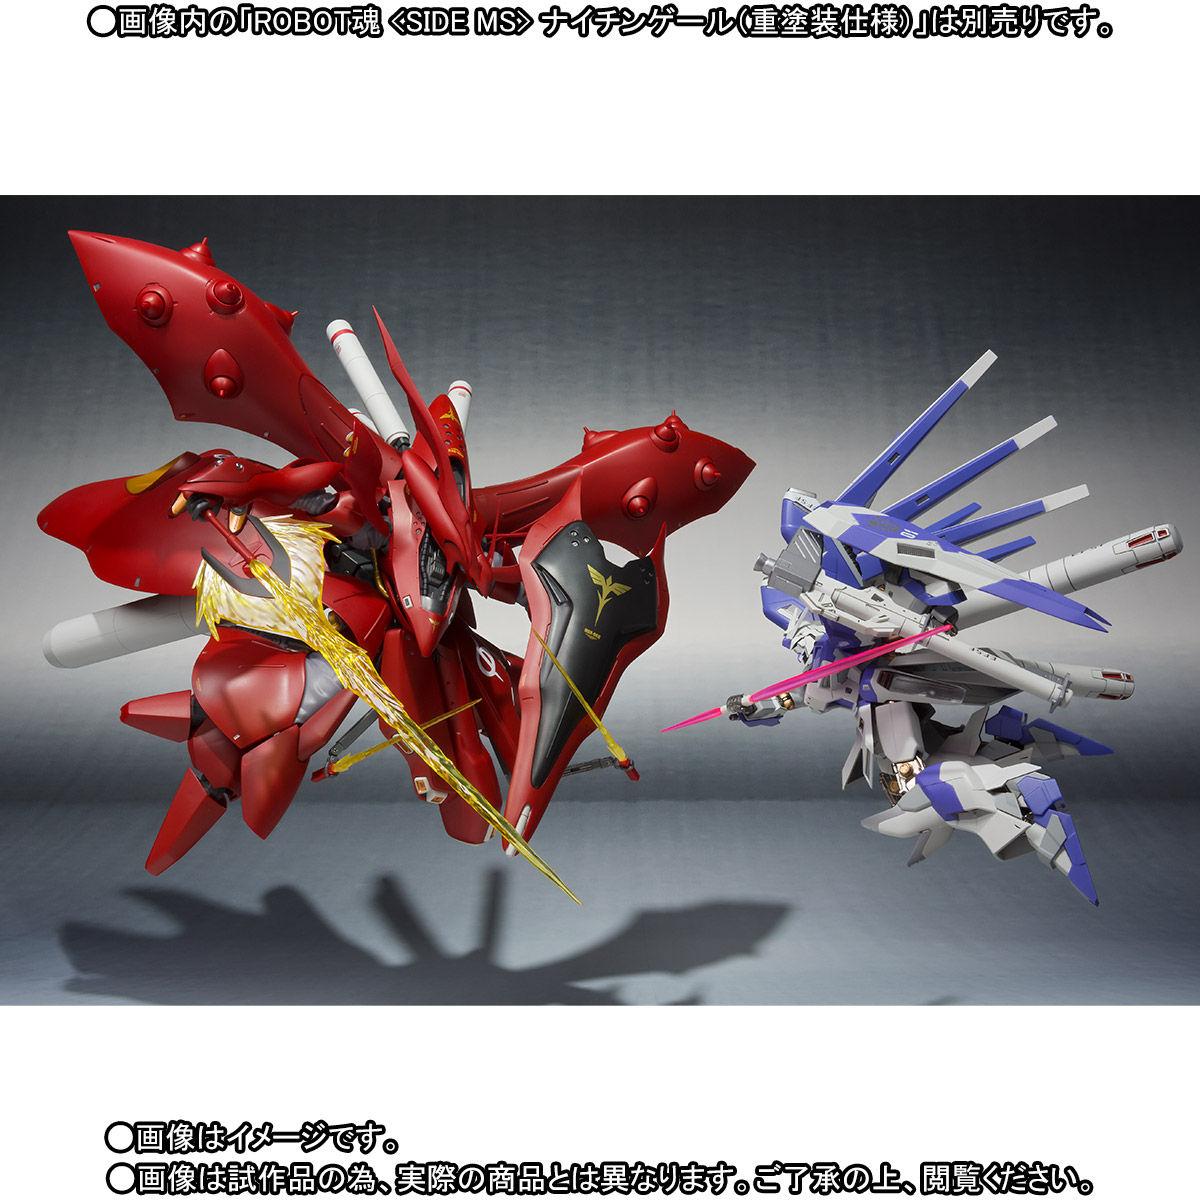 METAL ROBOT魂『Hi-νガンダム』逆襲のシャア 可動フィギュア-008